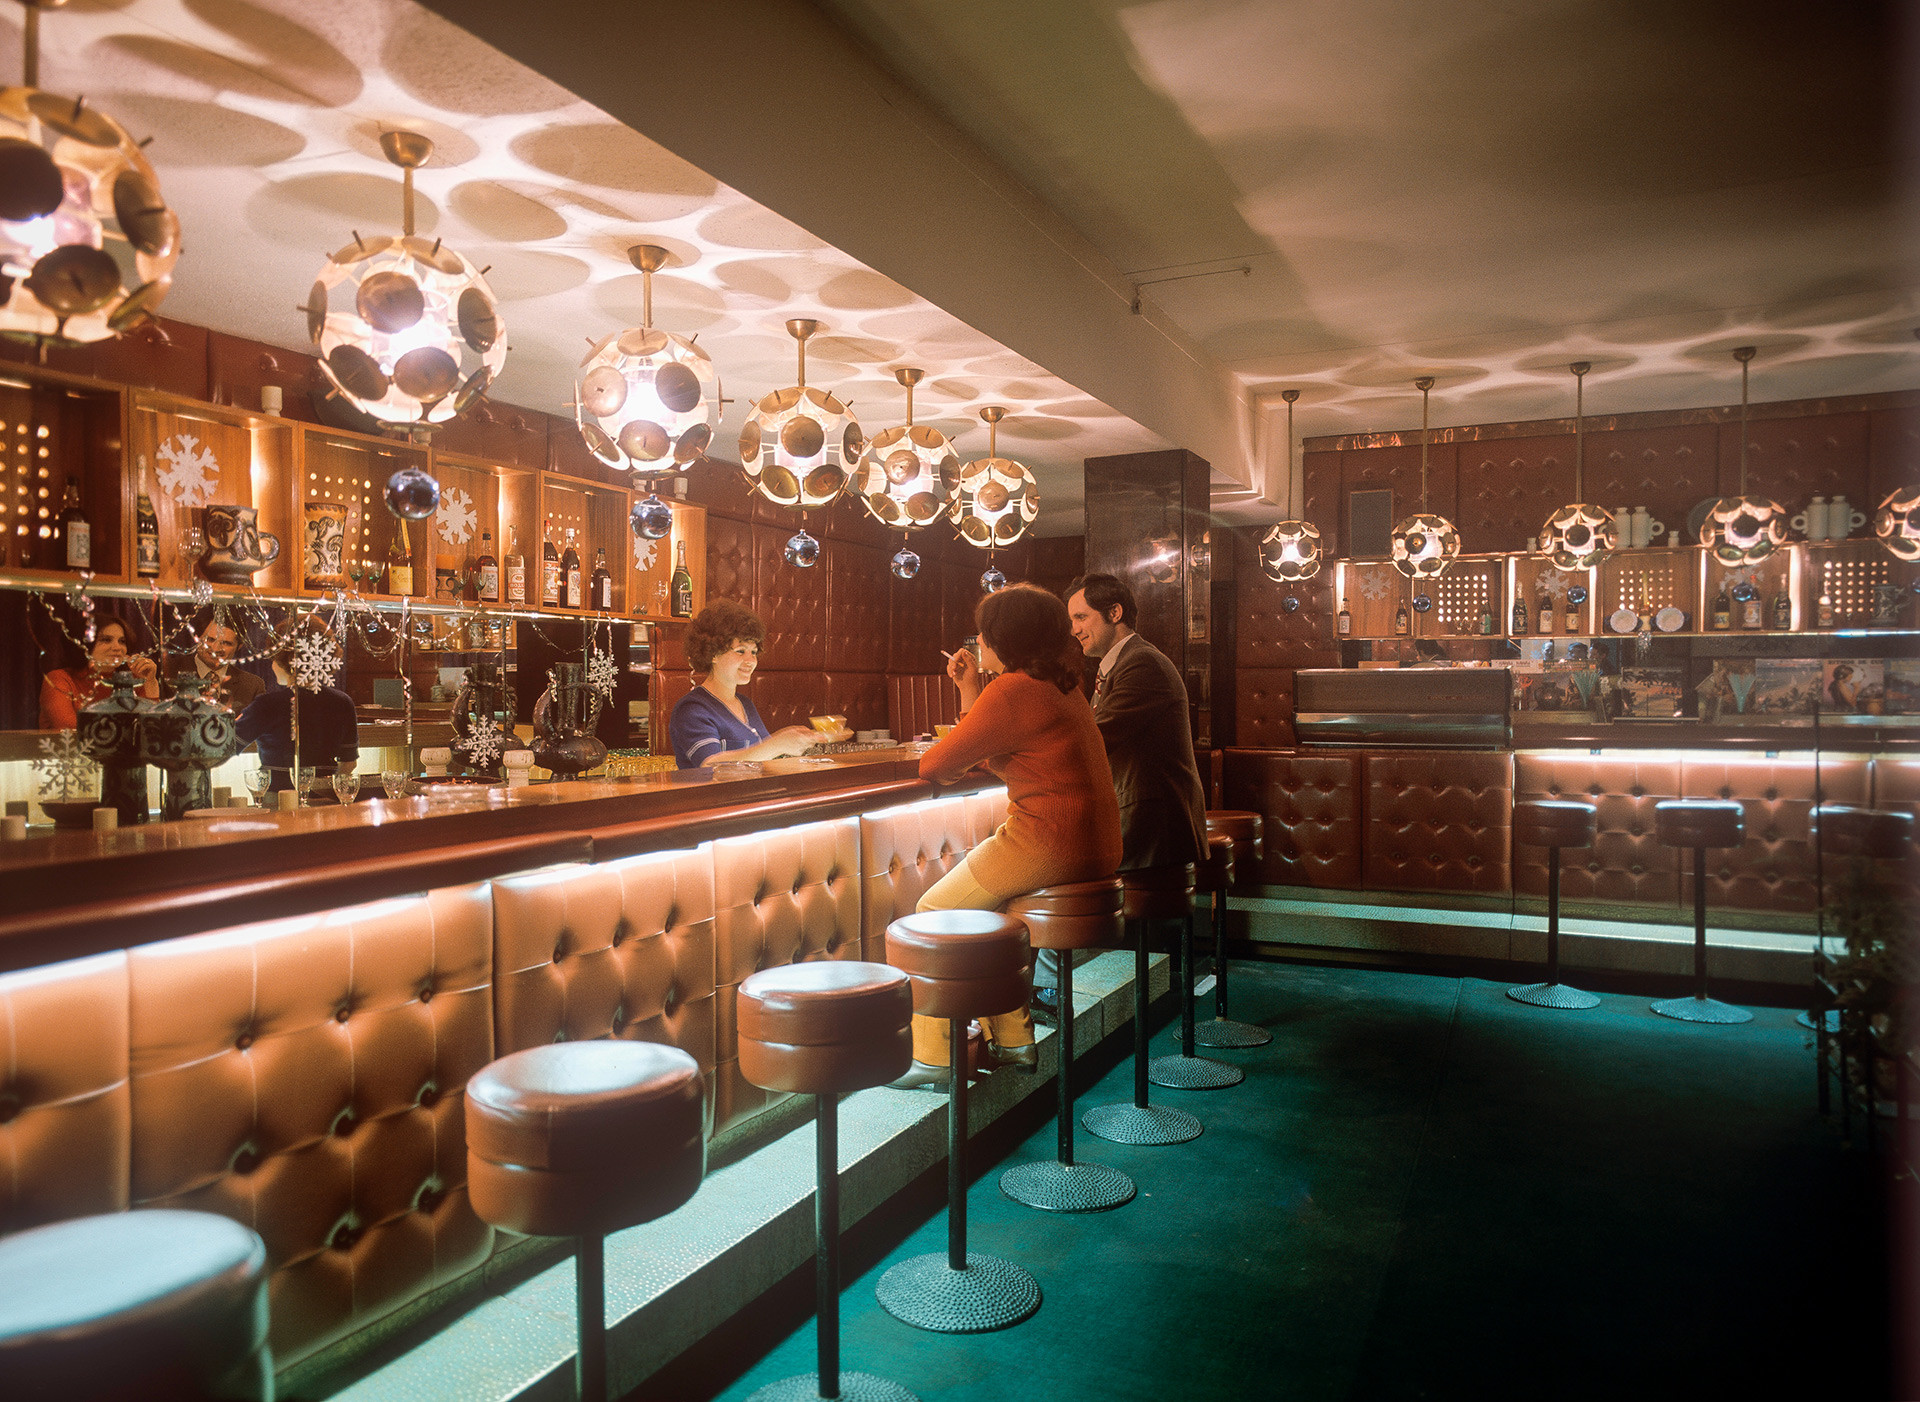 En el bar del restaurante ´Kavkaz´